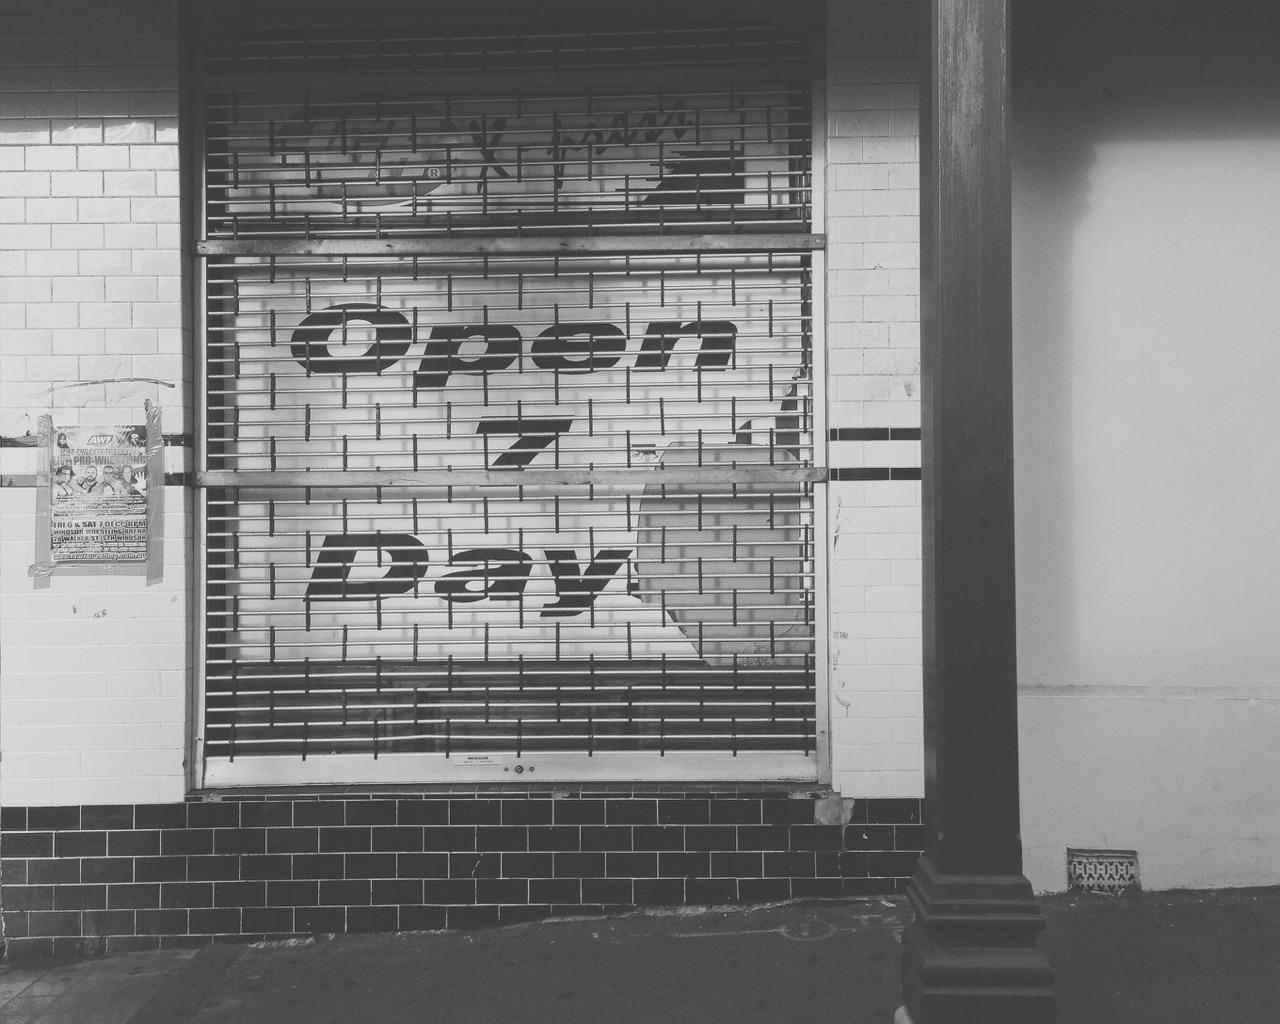 open 7 days #suburbia #rozelle